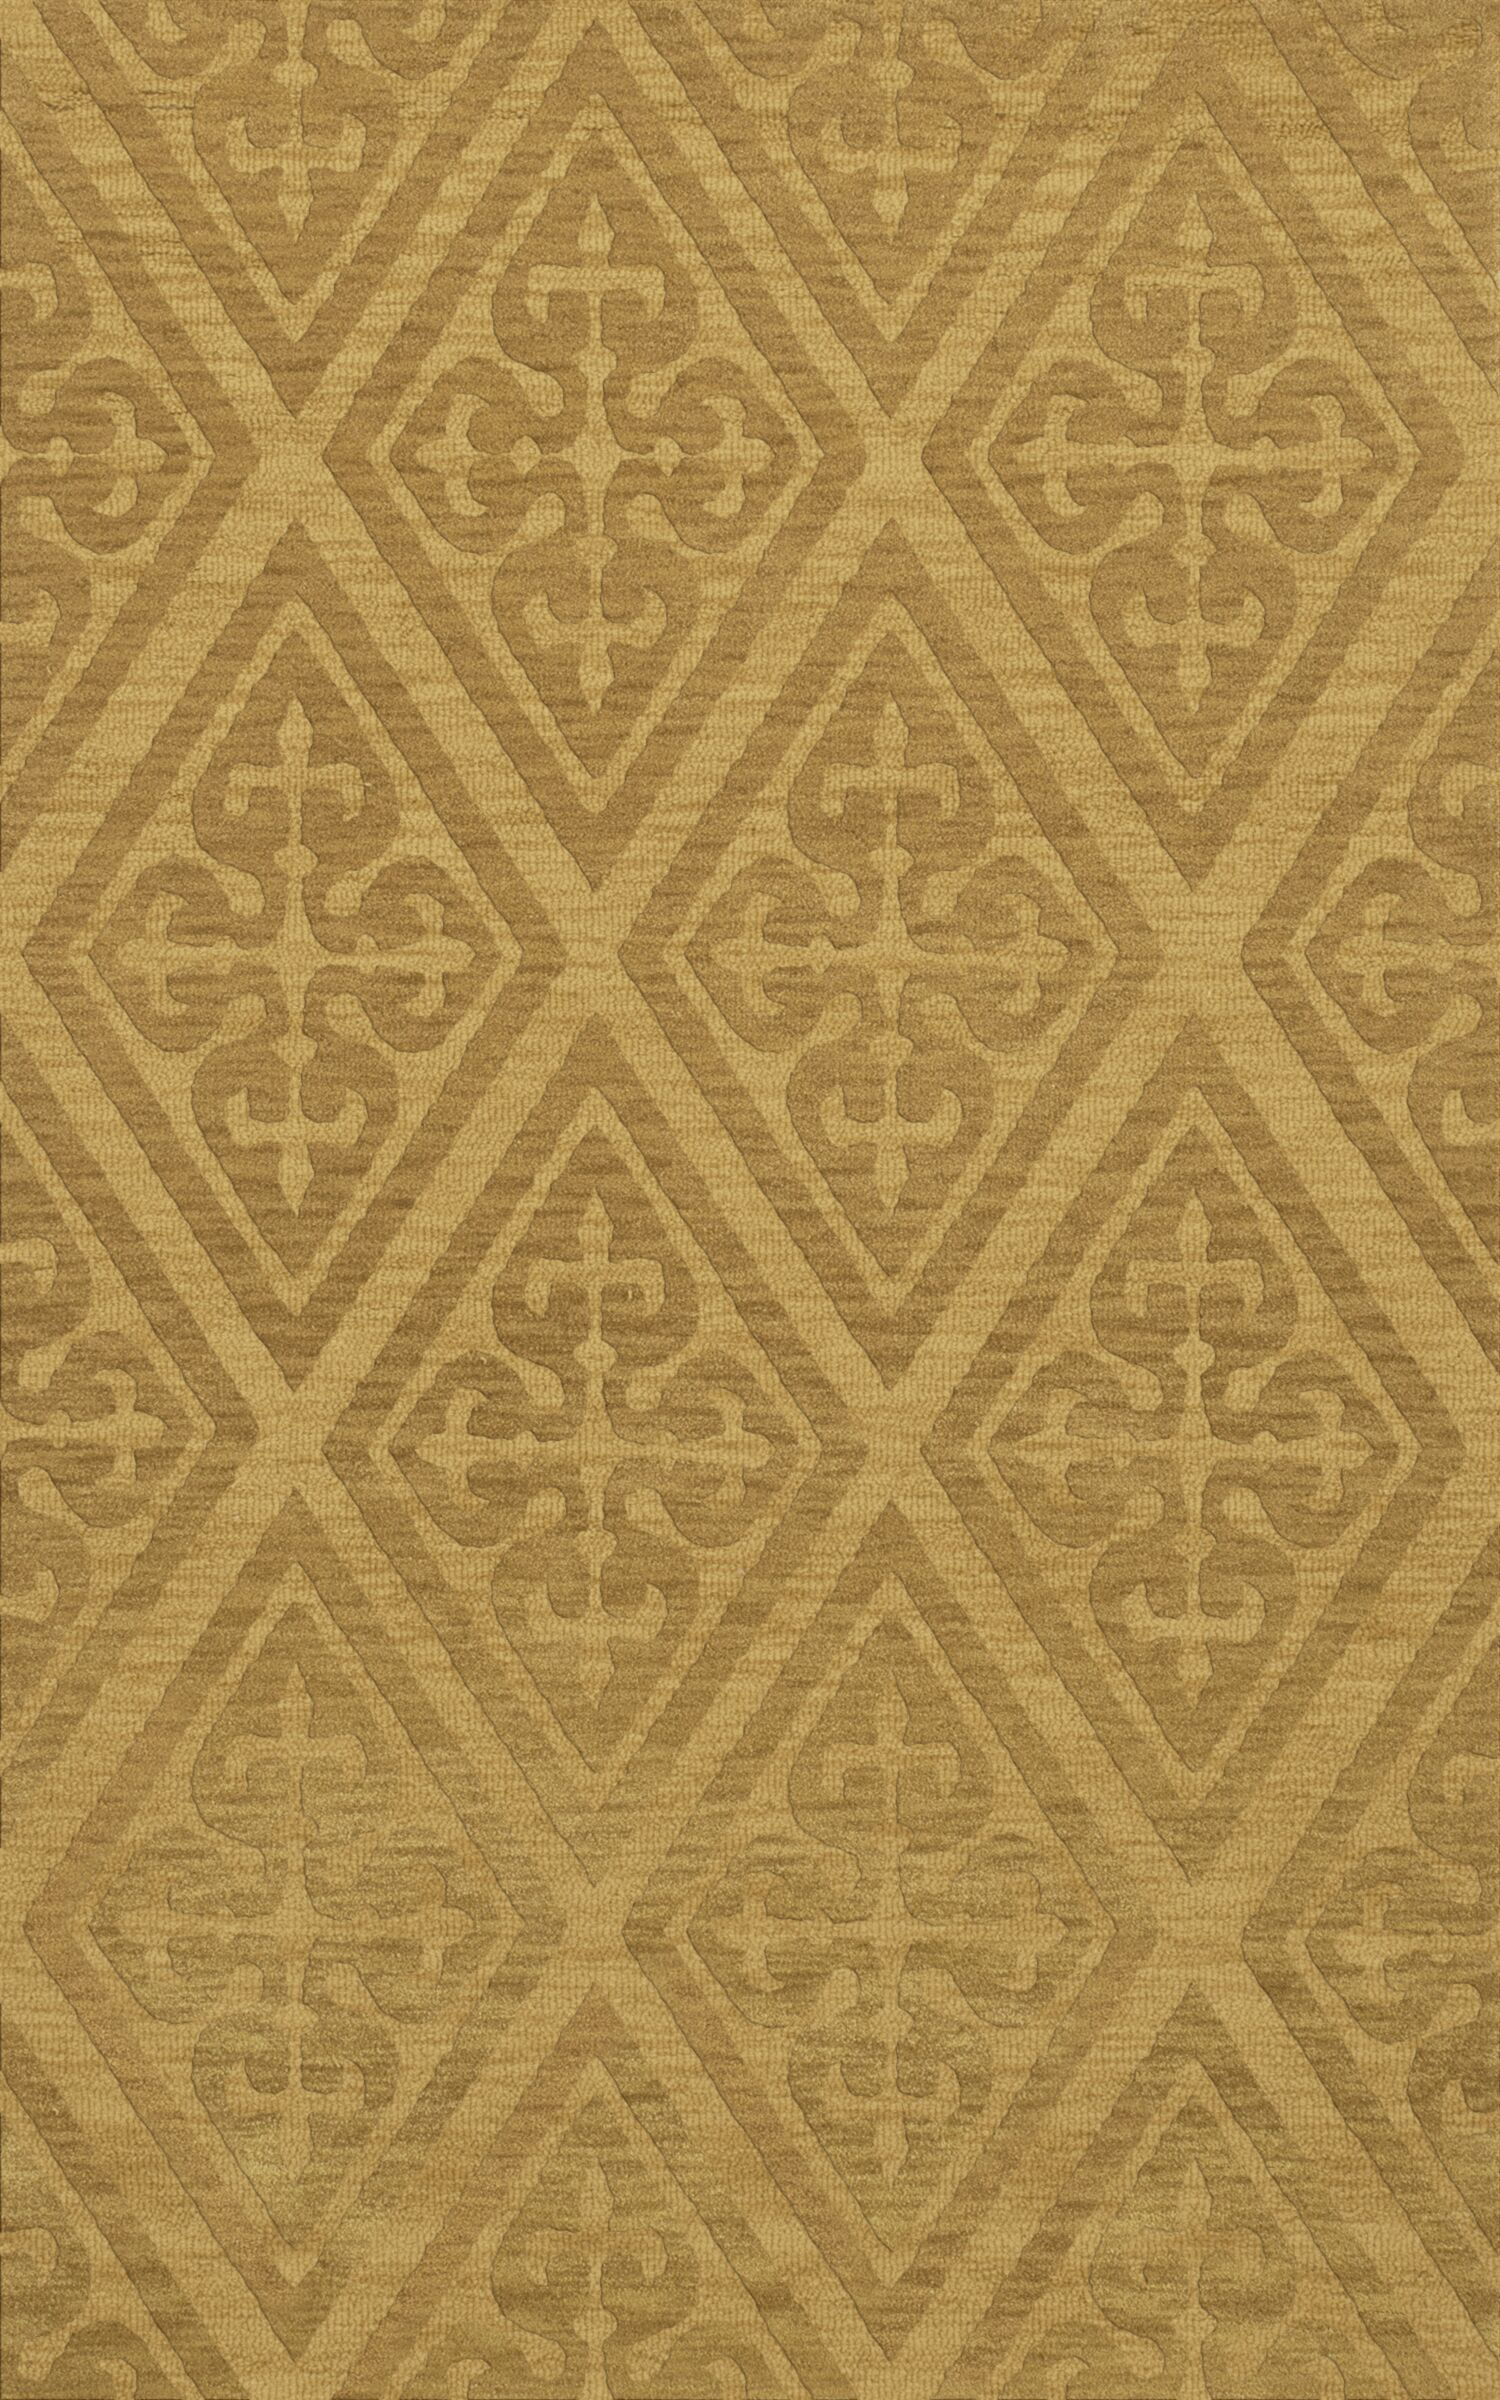 Bella Machine Woven Wool Beige Area Rug Rug Size: Rectangle 3' x 5'